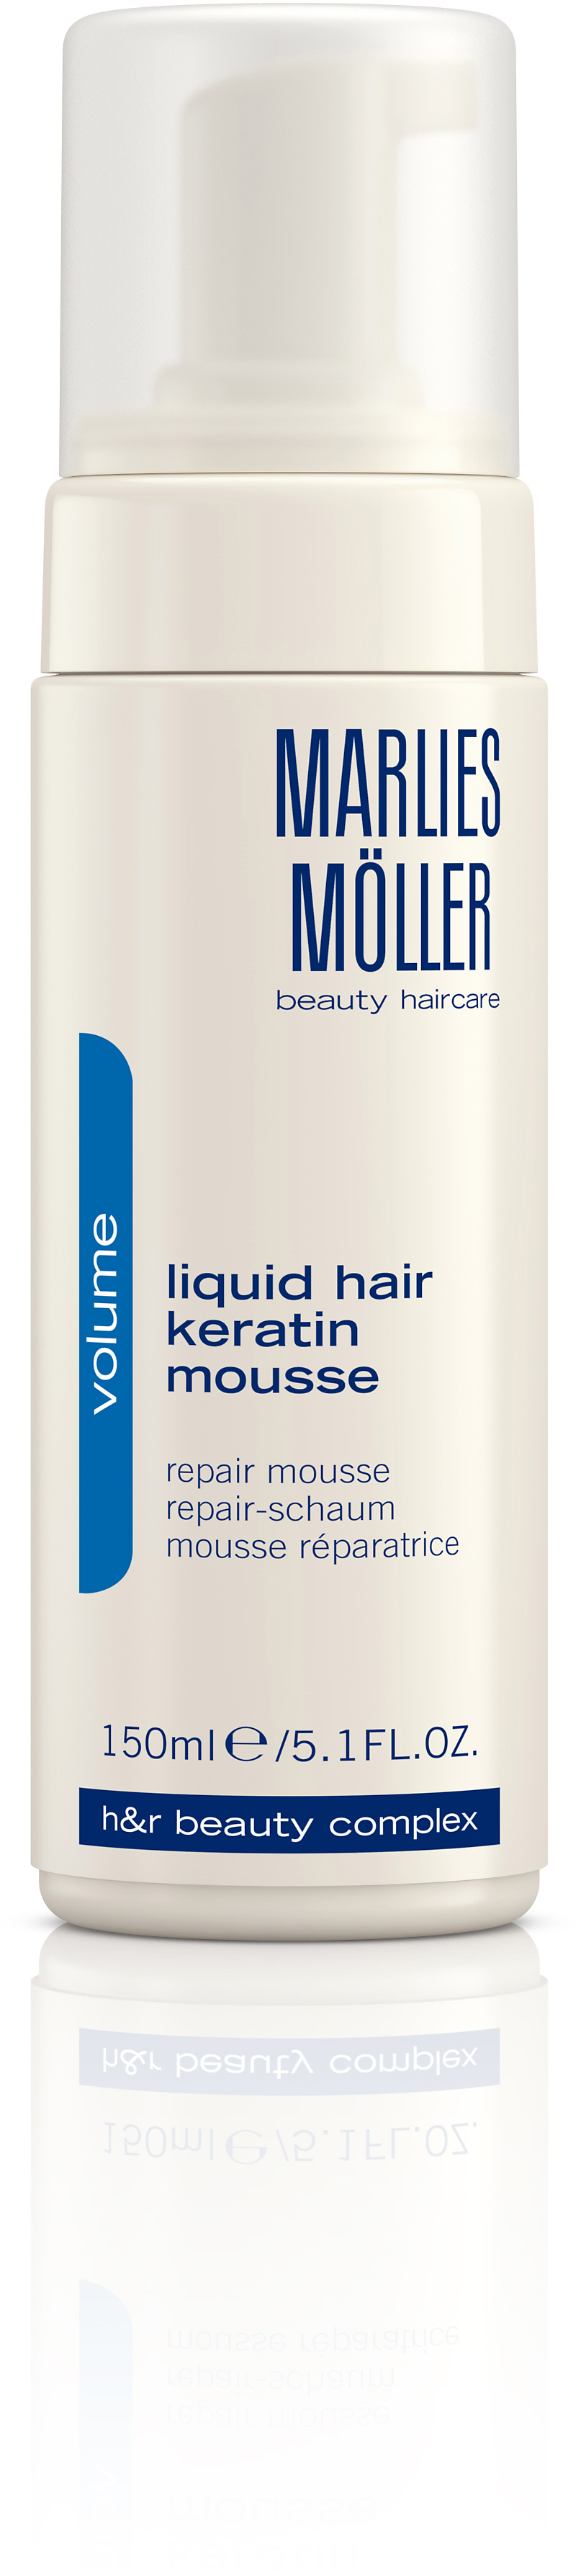 Marlies Möller Care Liquid Hair 150 ml